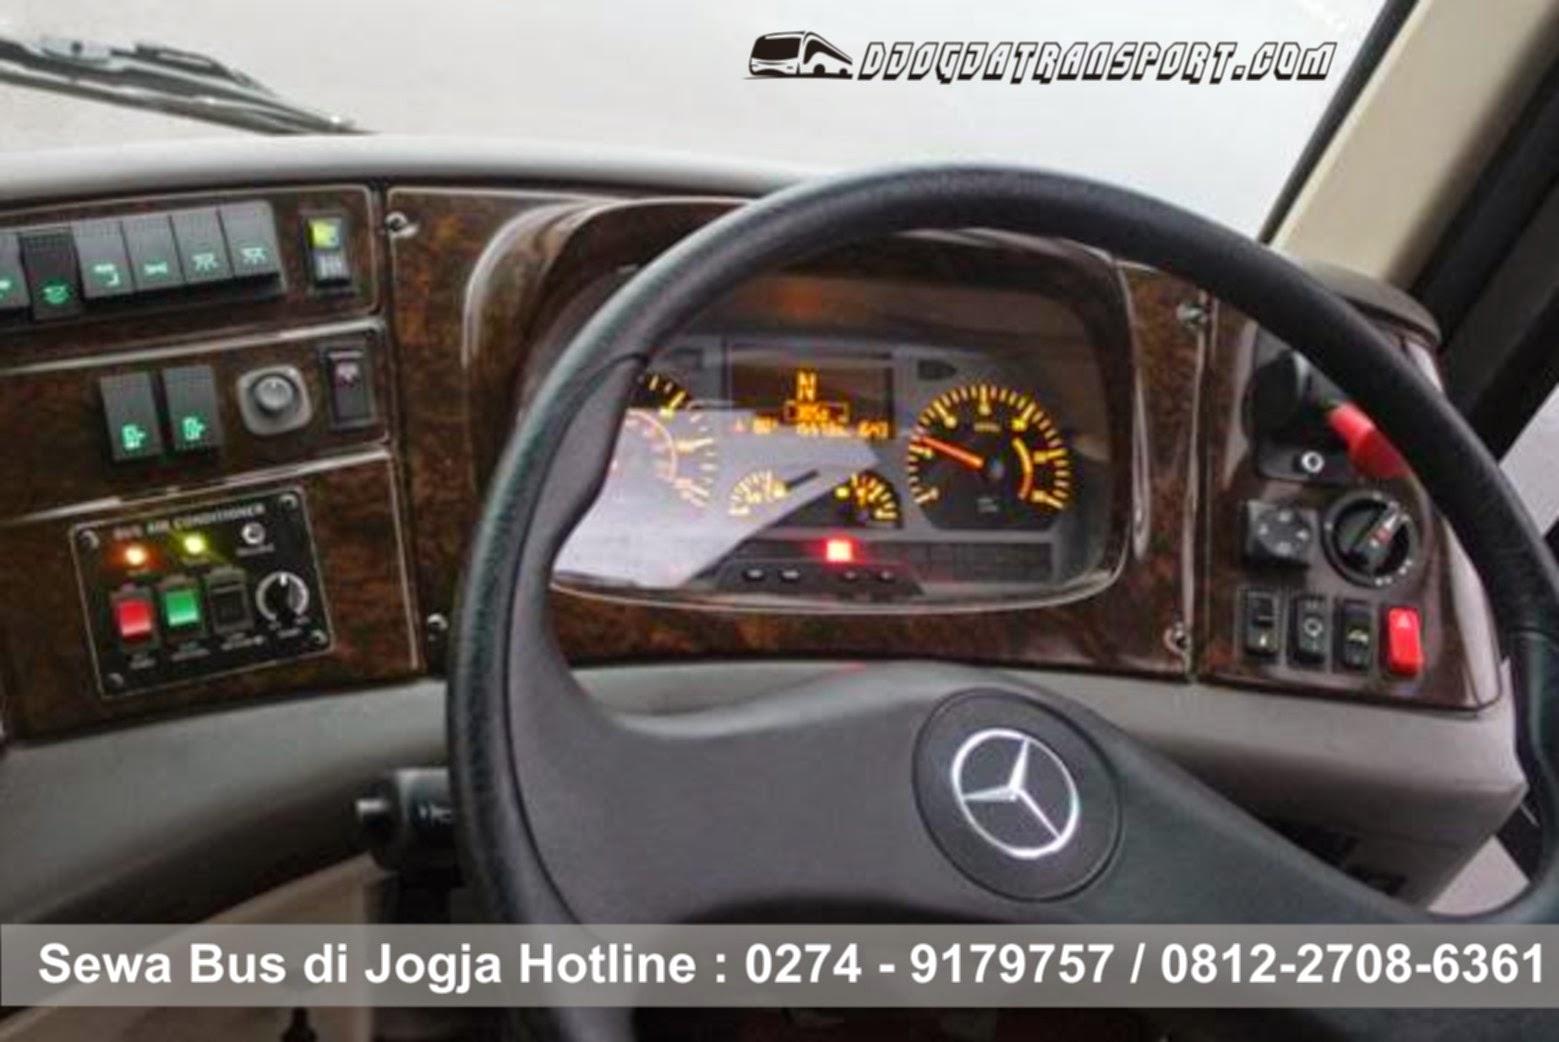 sewa big bus ac wisata di Jogja